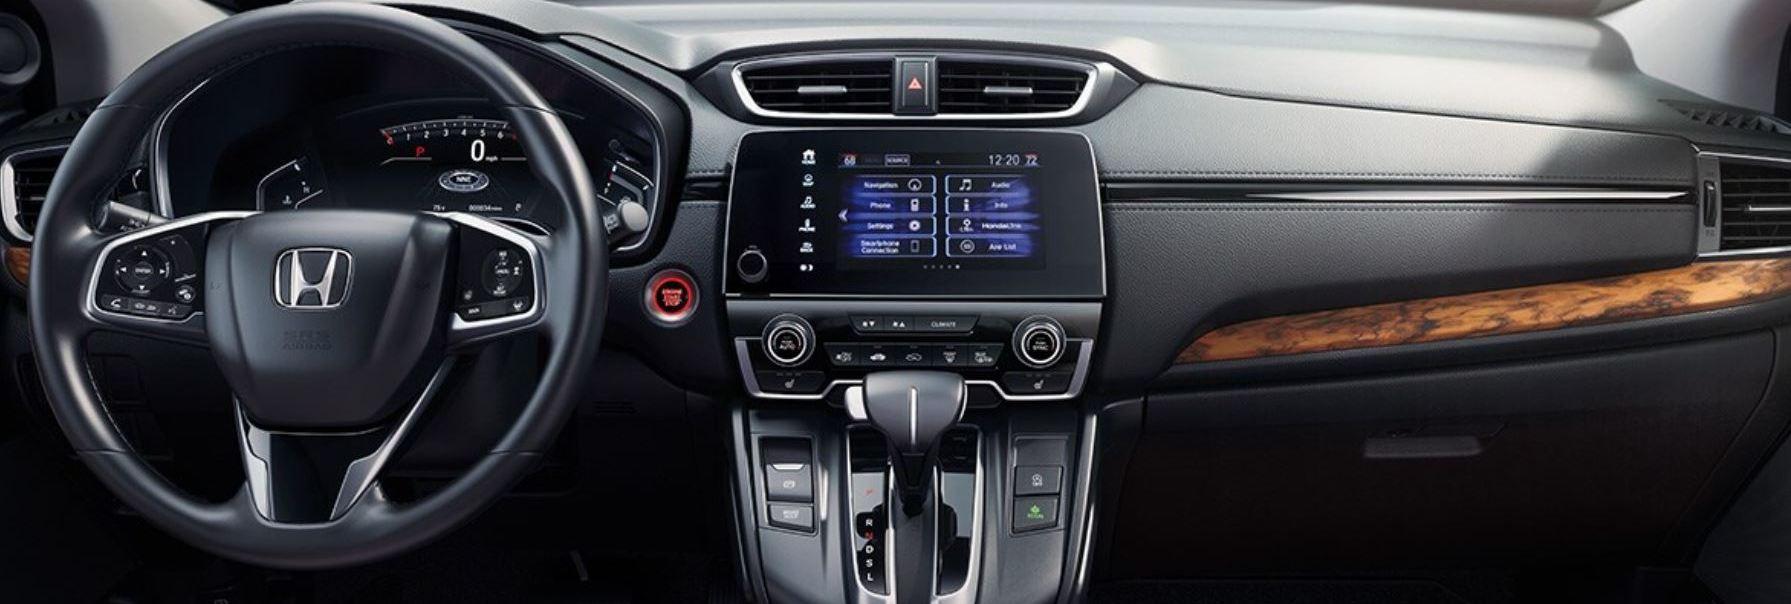 2020 Honda CR-V Dashboard